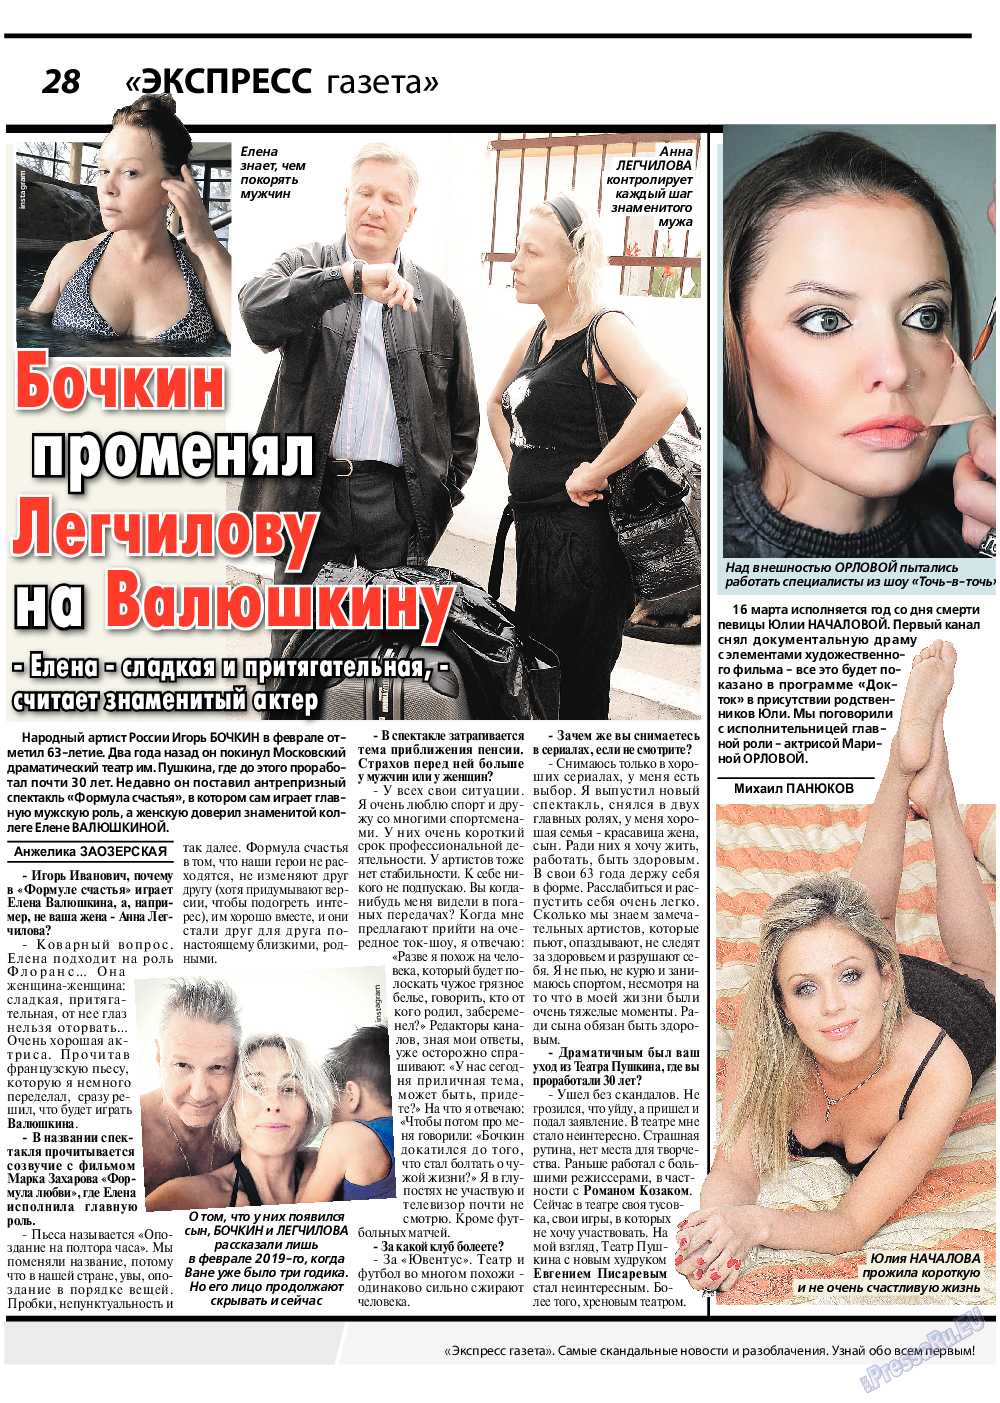 Экспресс газета (газета). 2020 год, номер 4, стр. 28